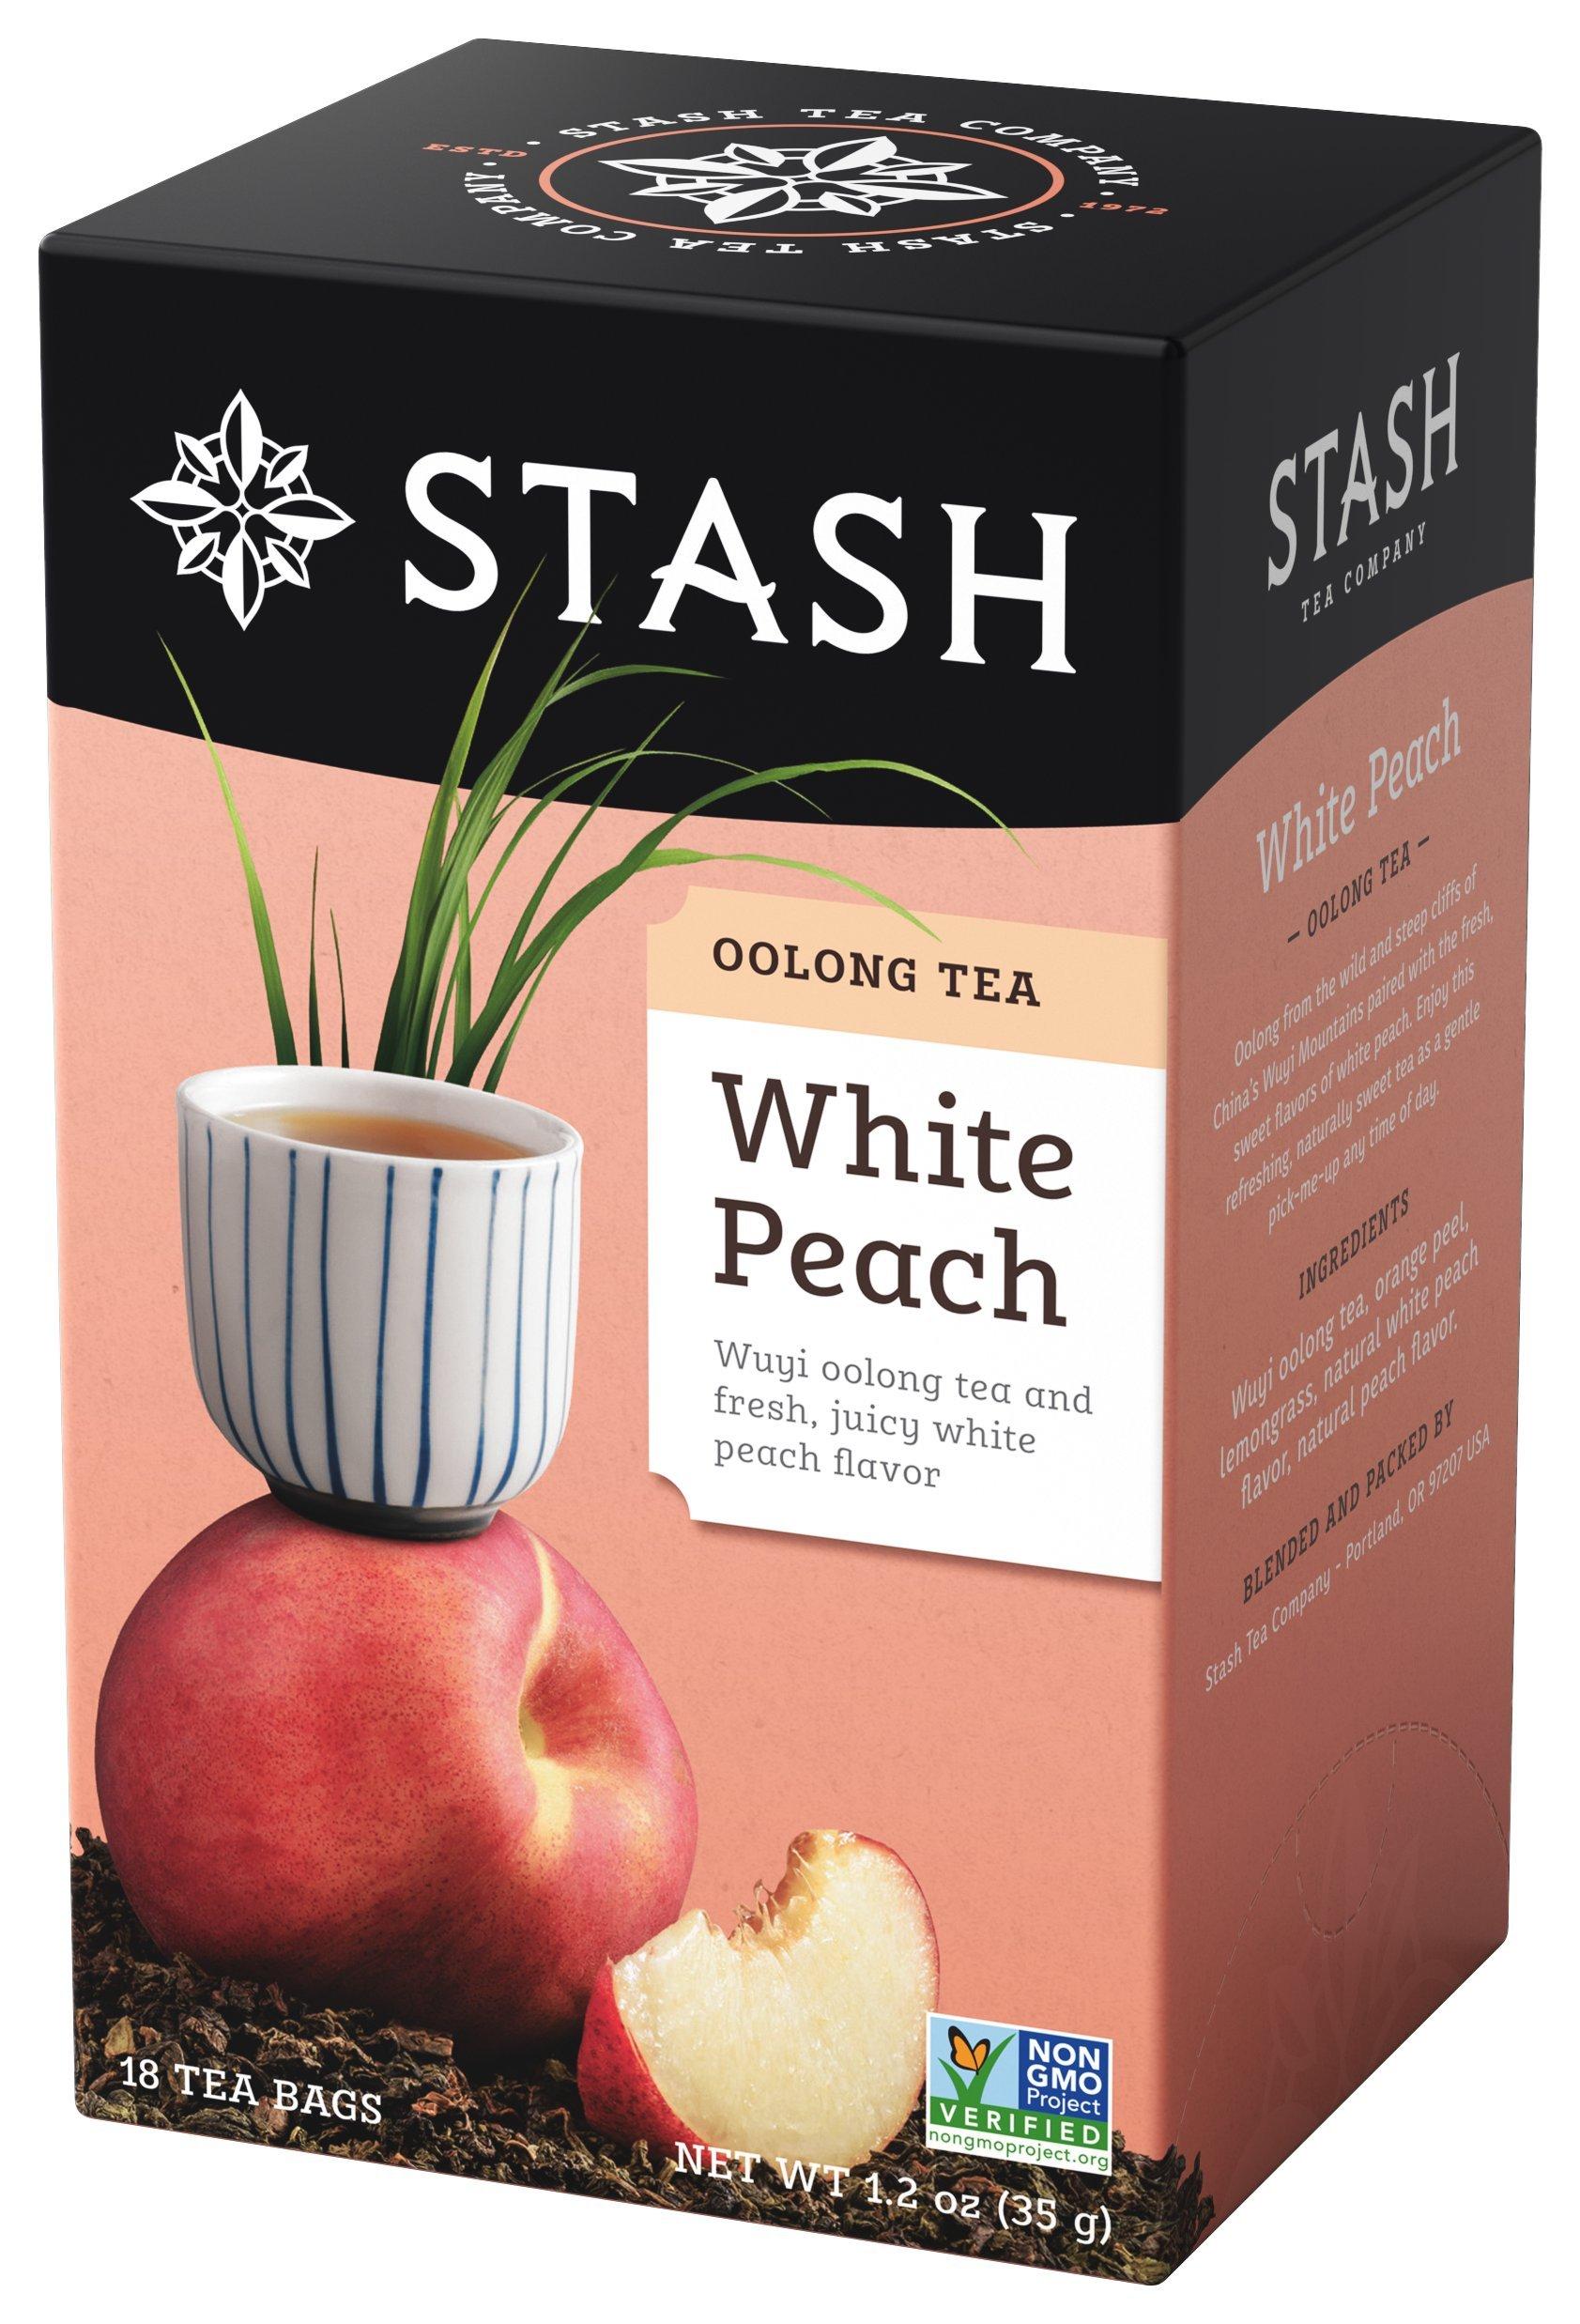 Stash Tea White Peach Wuyi Oolong Tea, 1.2 oz, 18 Count Tea Bags in Foil (Pack of 6)